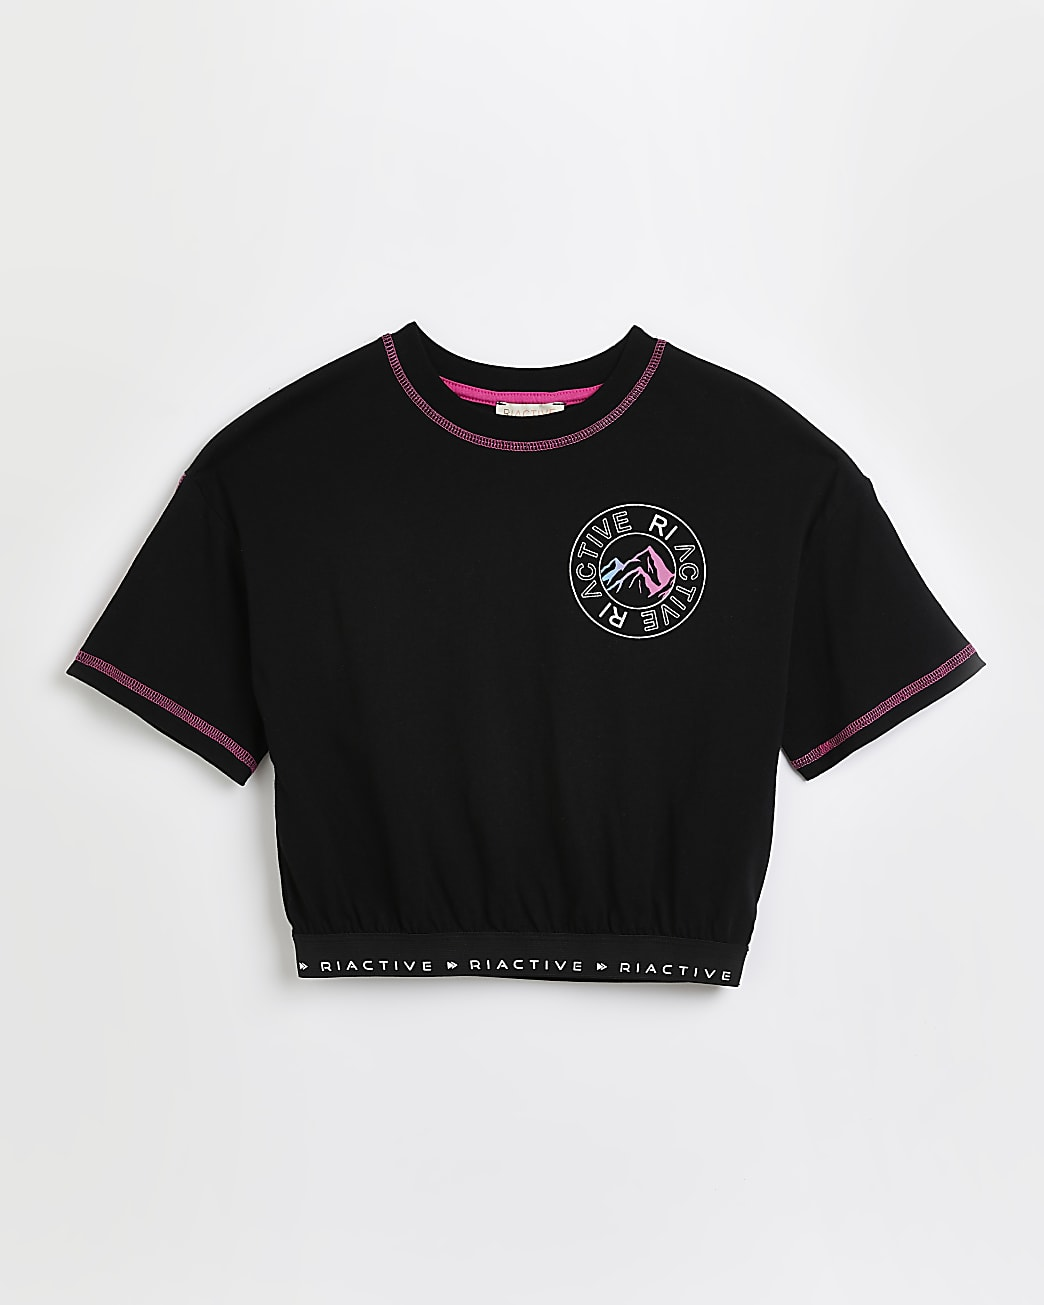 Girls black RI Active back print t-shirt